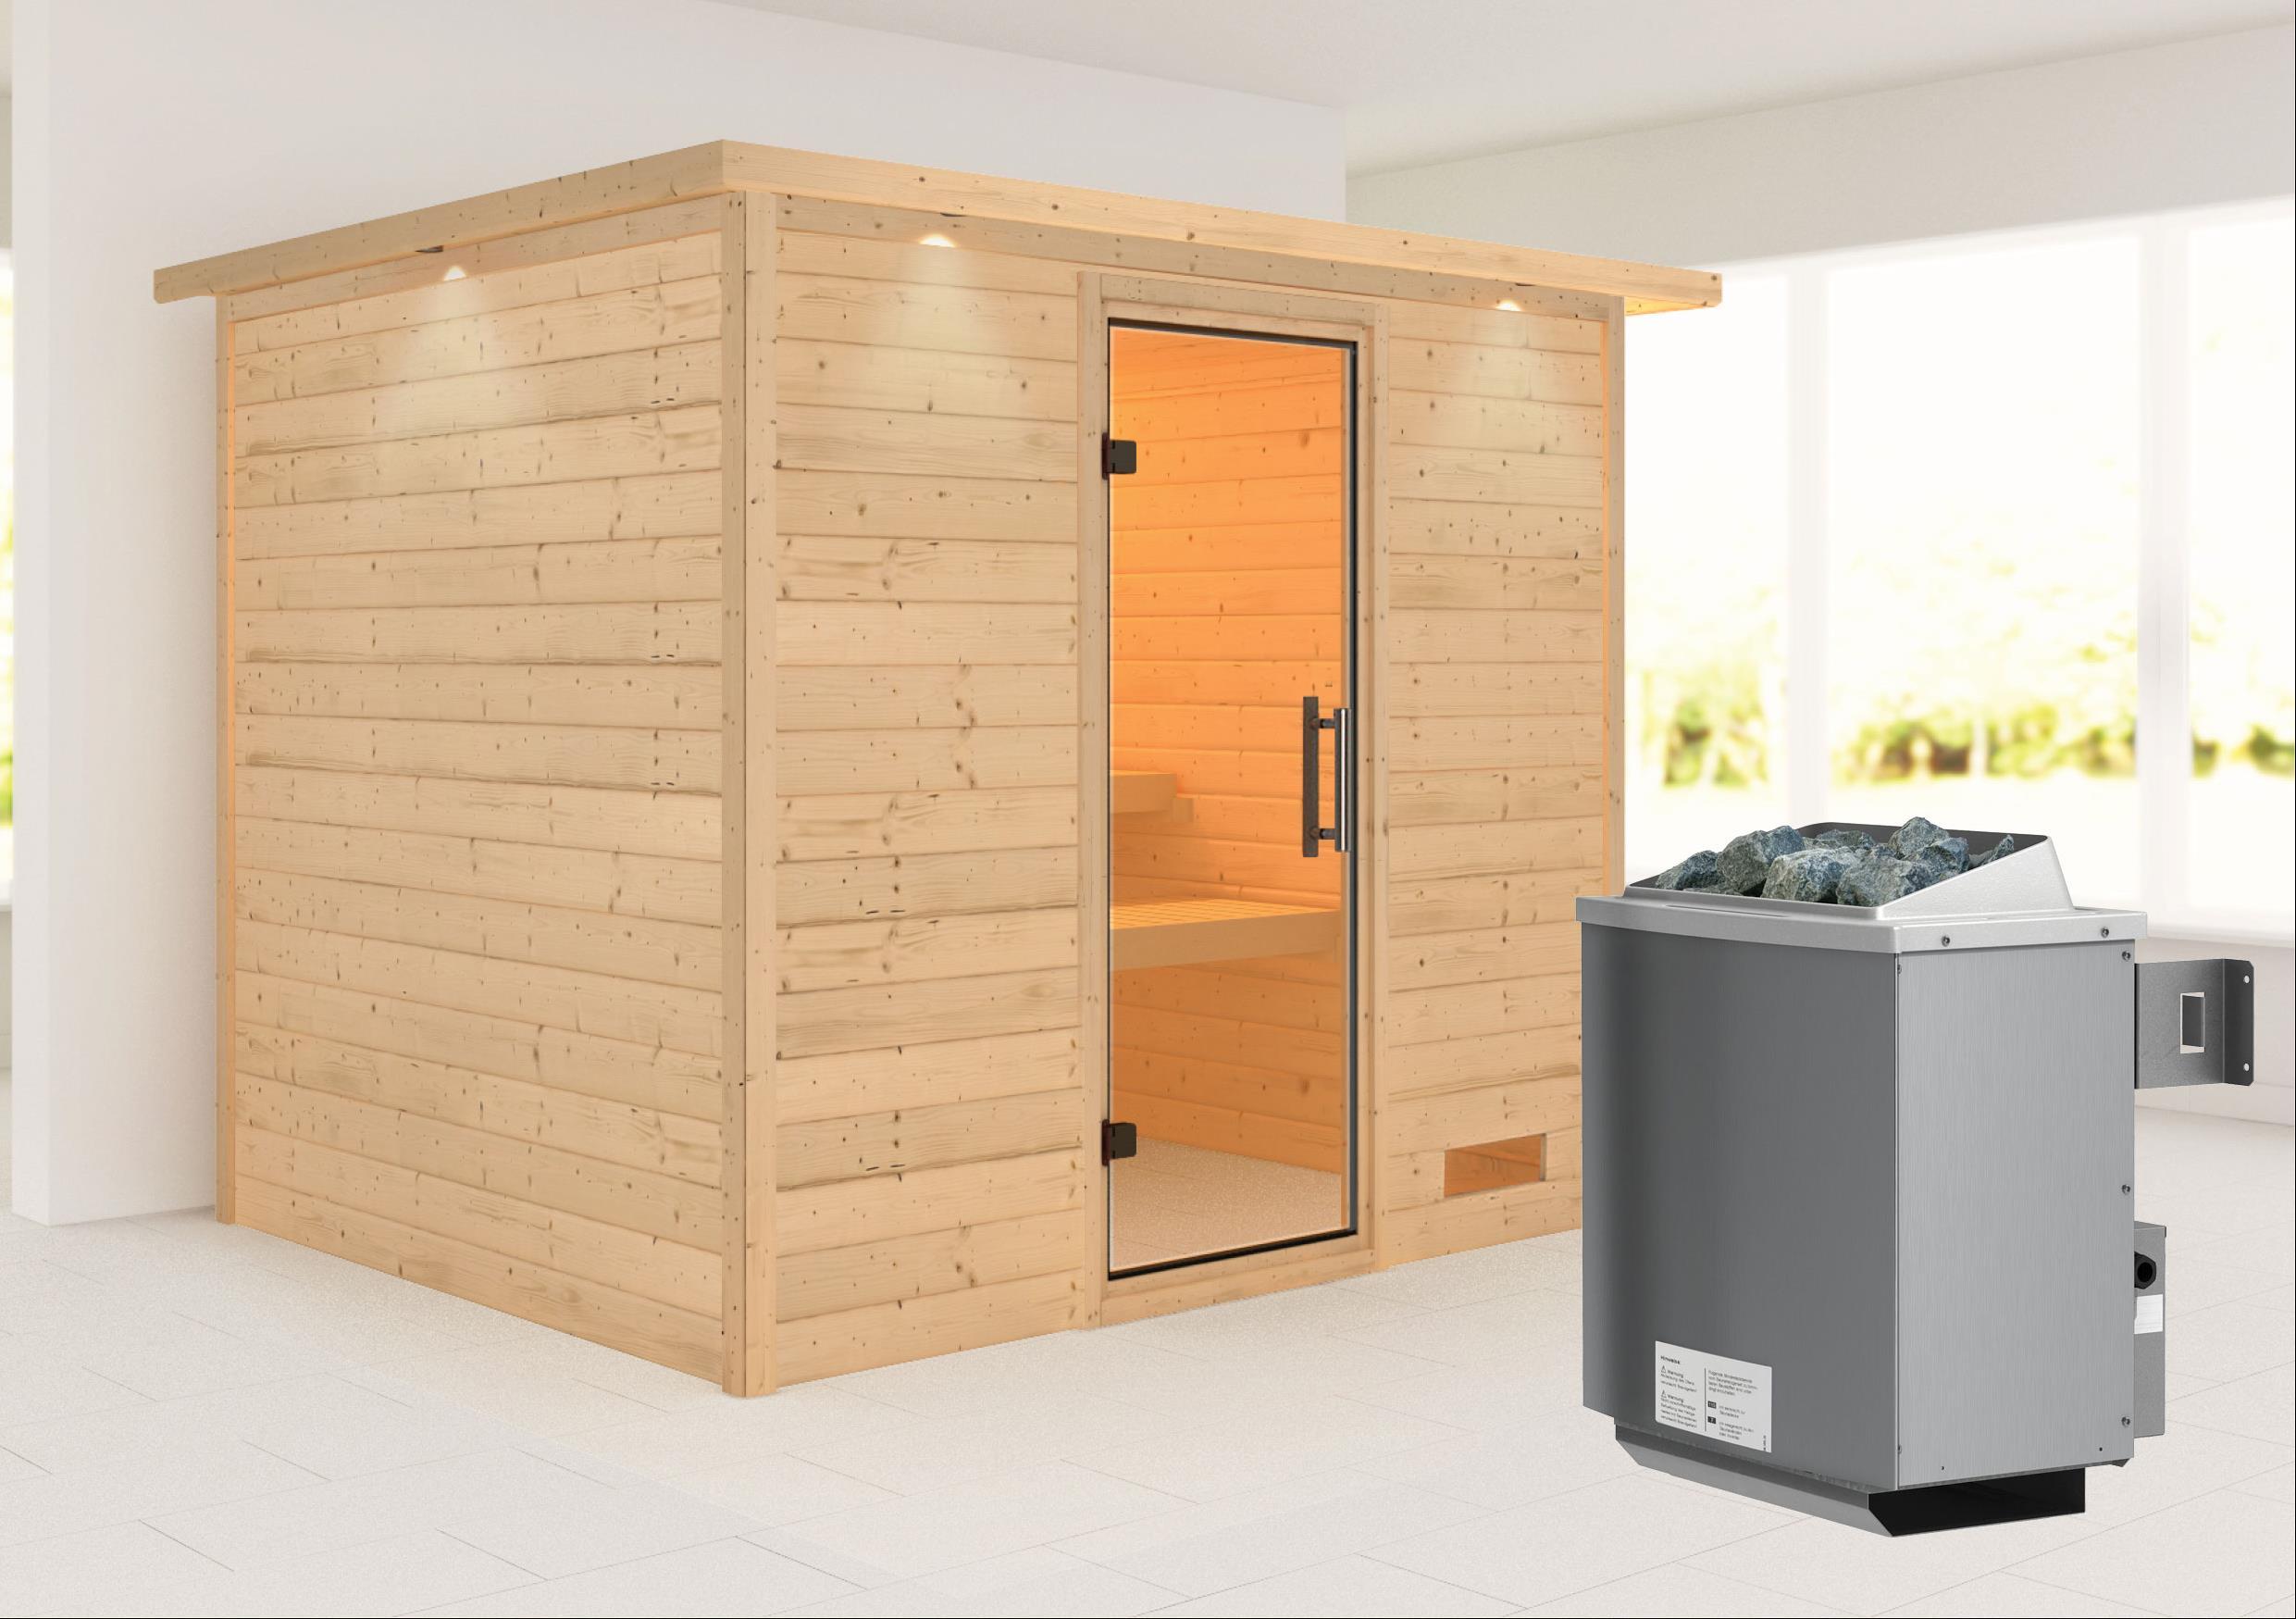 Woodfeeling Sauna Karla 38mm Kranz Ofen 9kW intern Tür Klarglas Bild 1